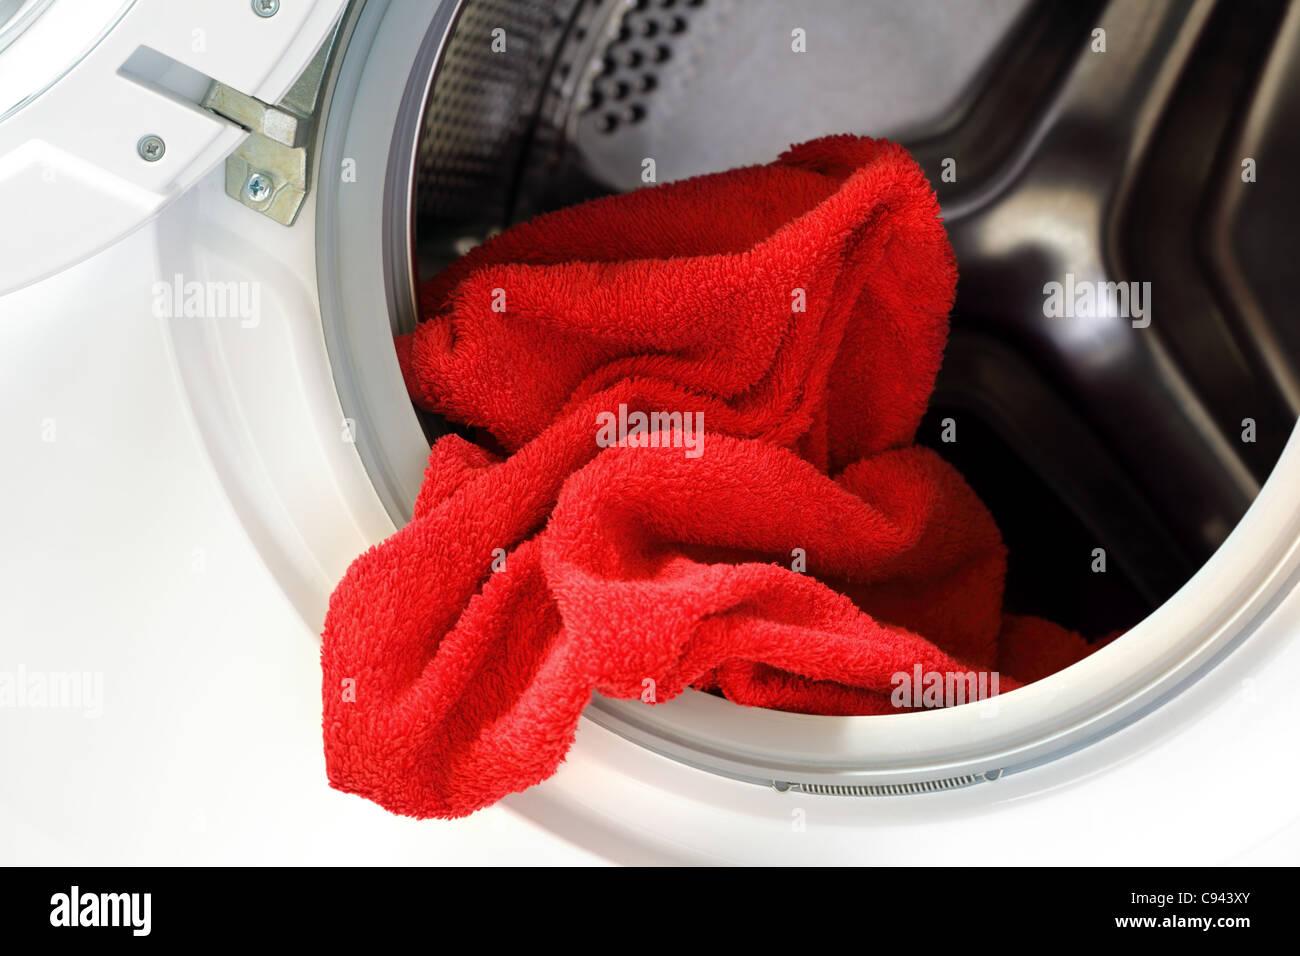 Washing machine - Stock Image